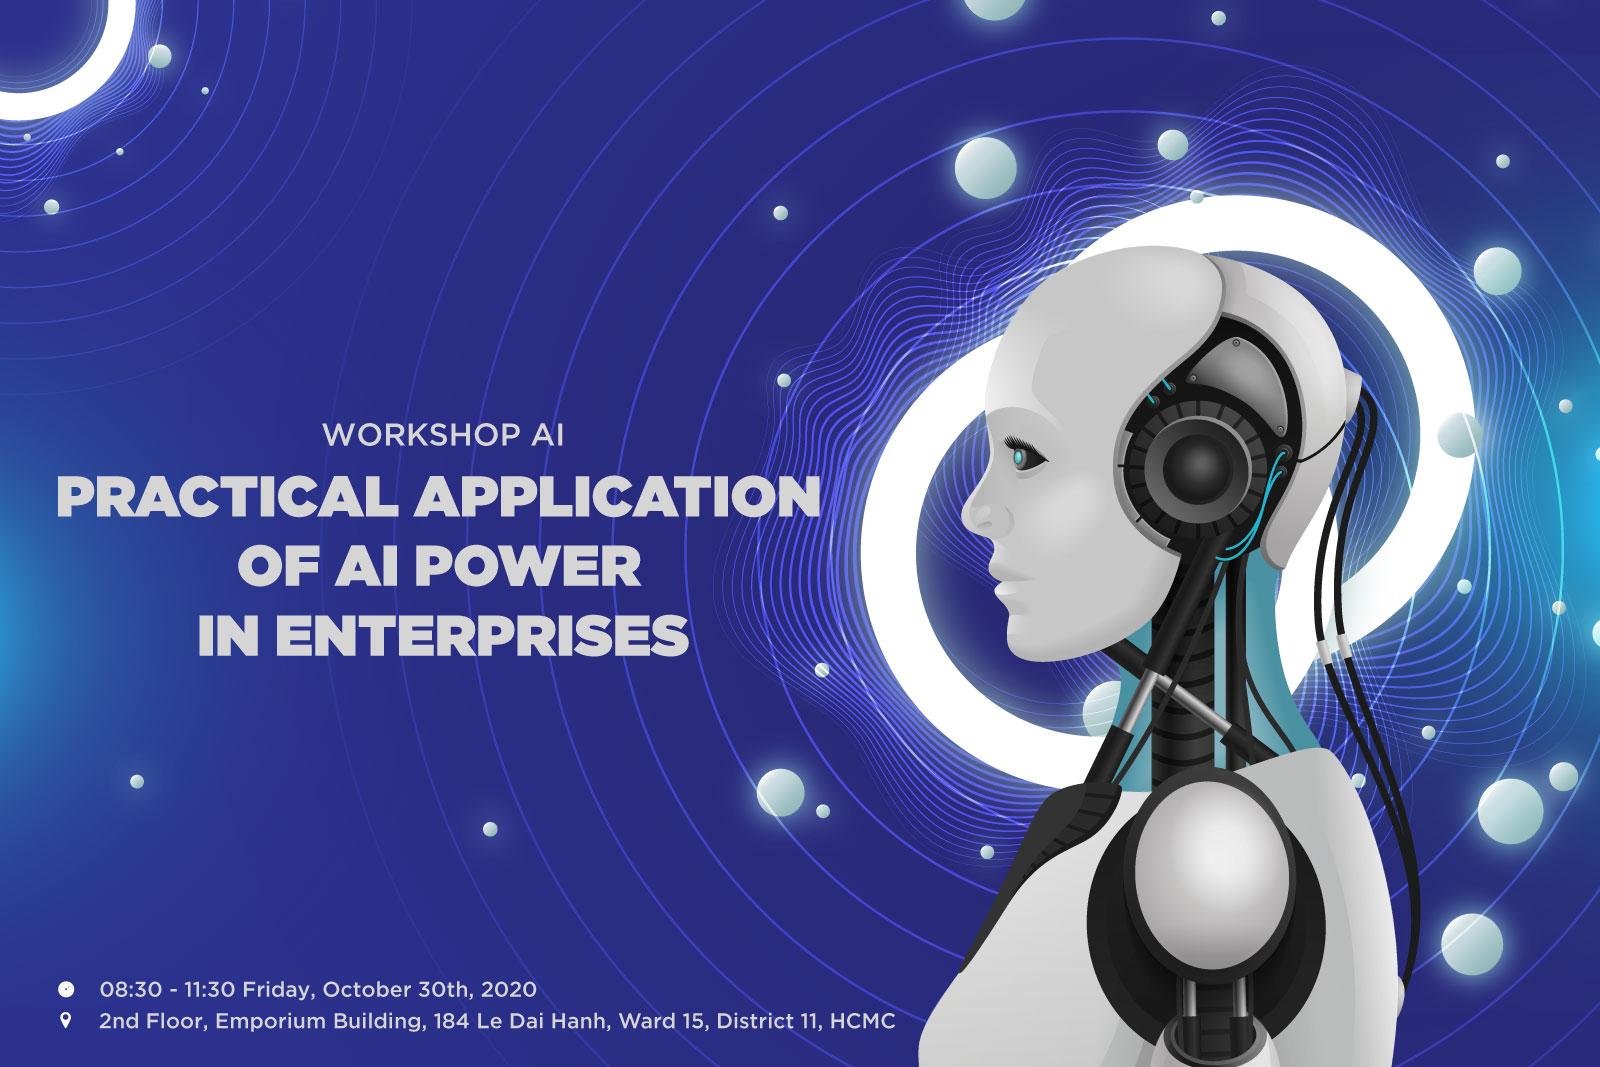 workshop-ai-vtc-academy-1